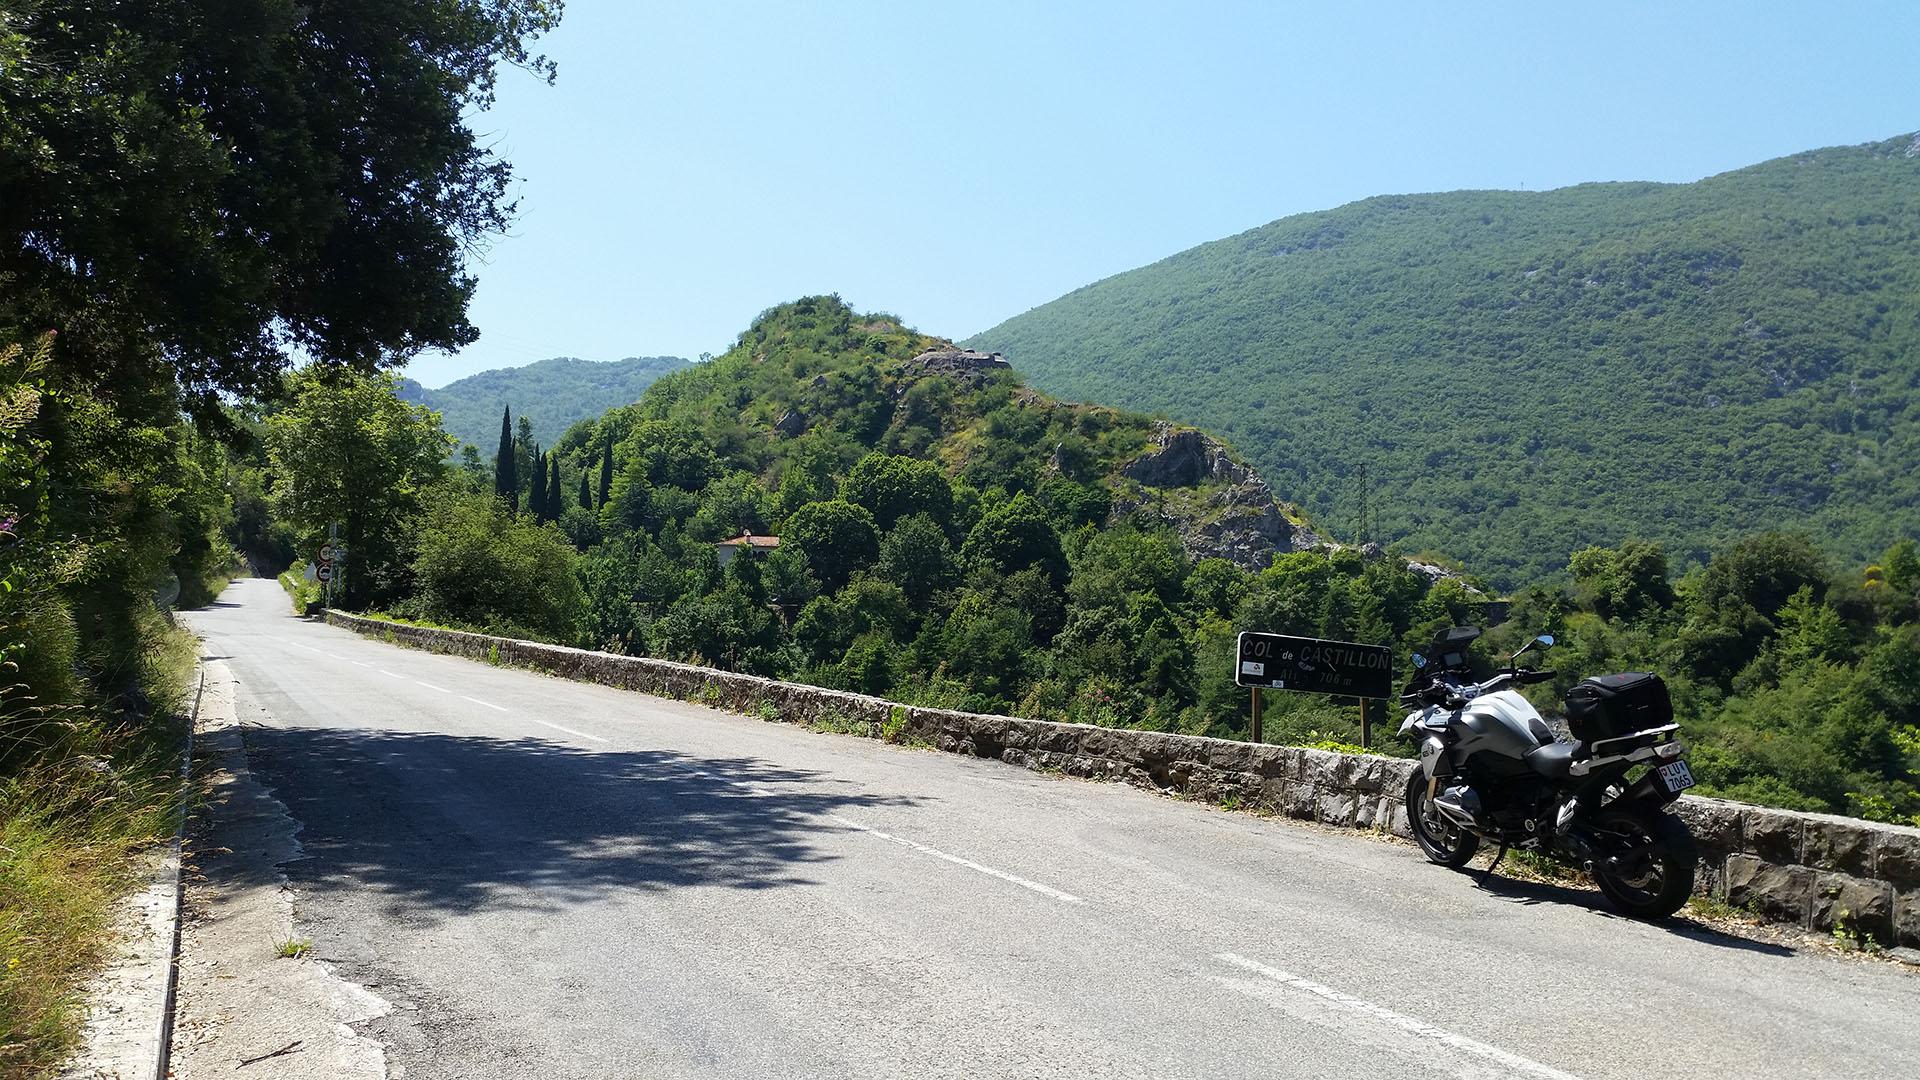 0706 - F - Col de Castillon